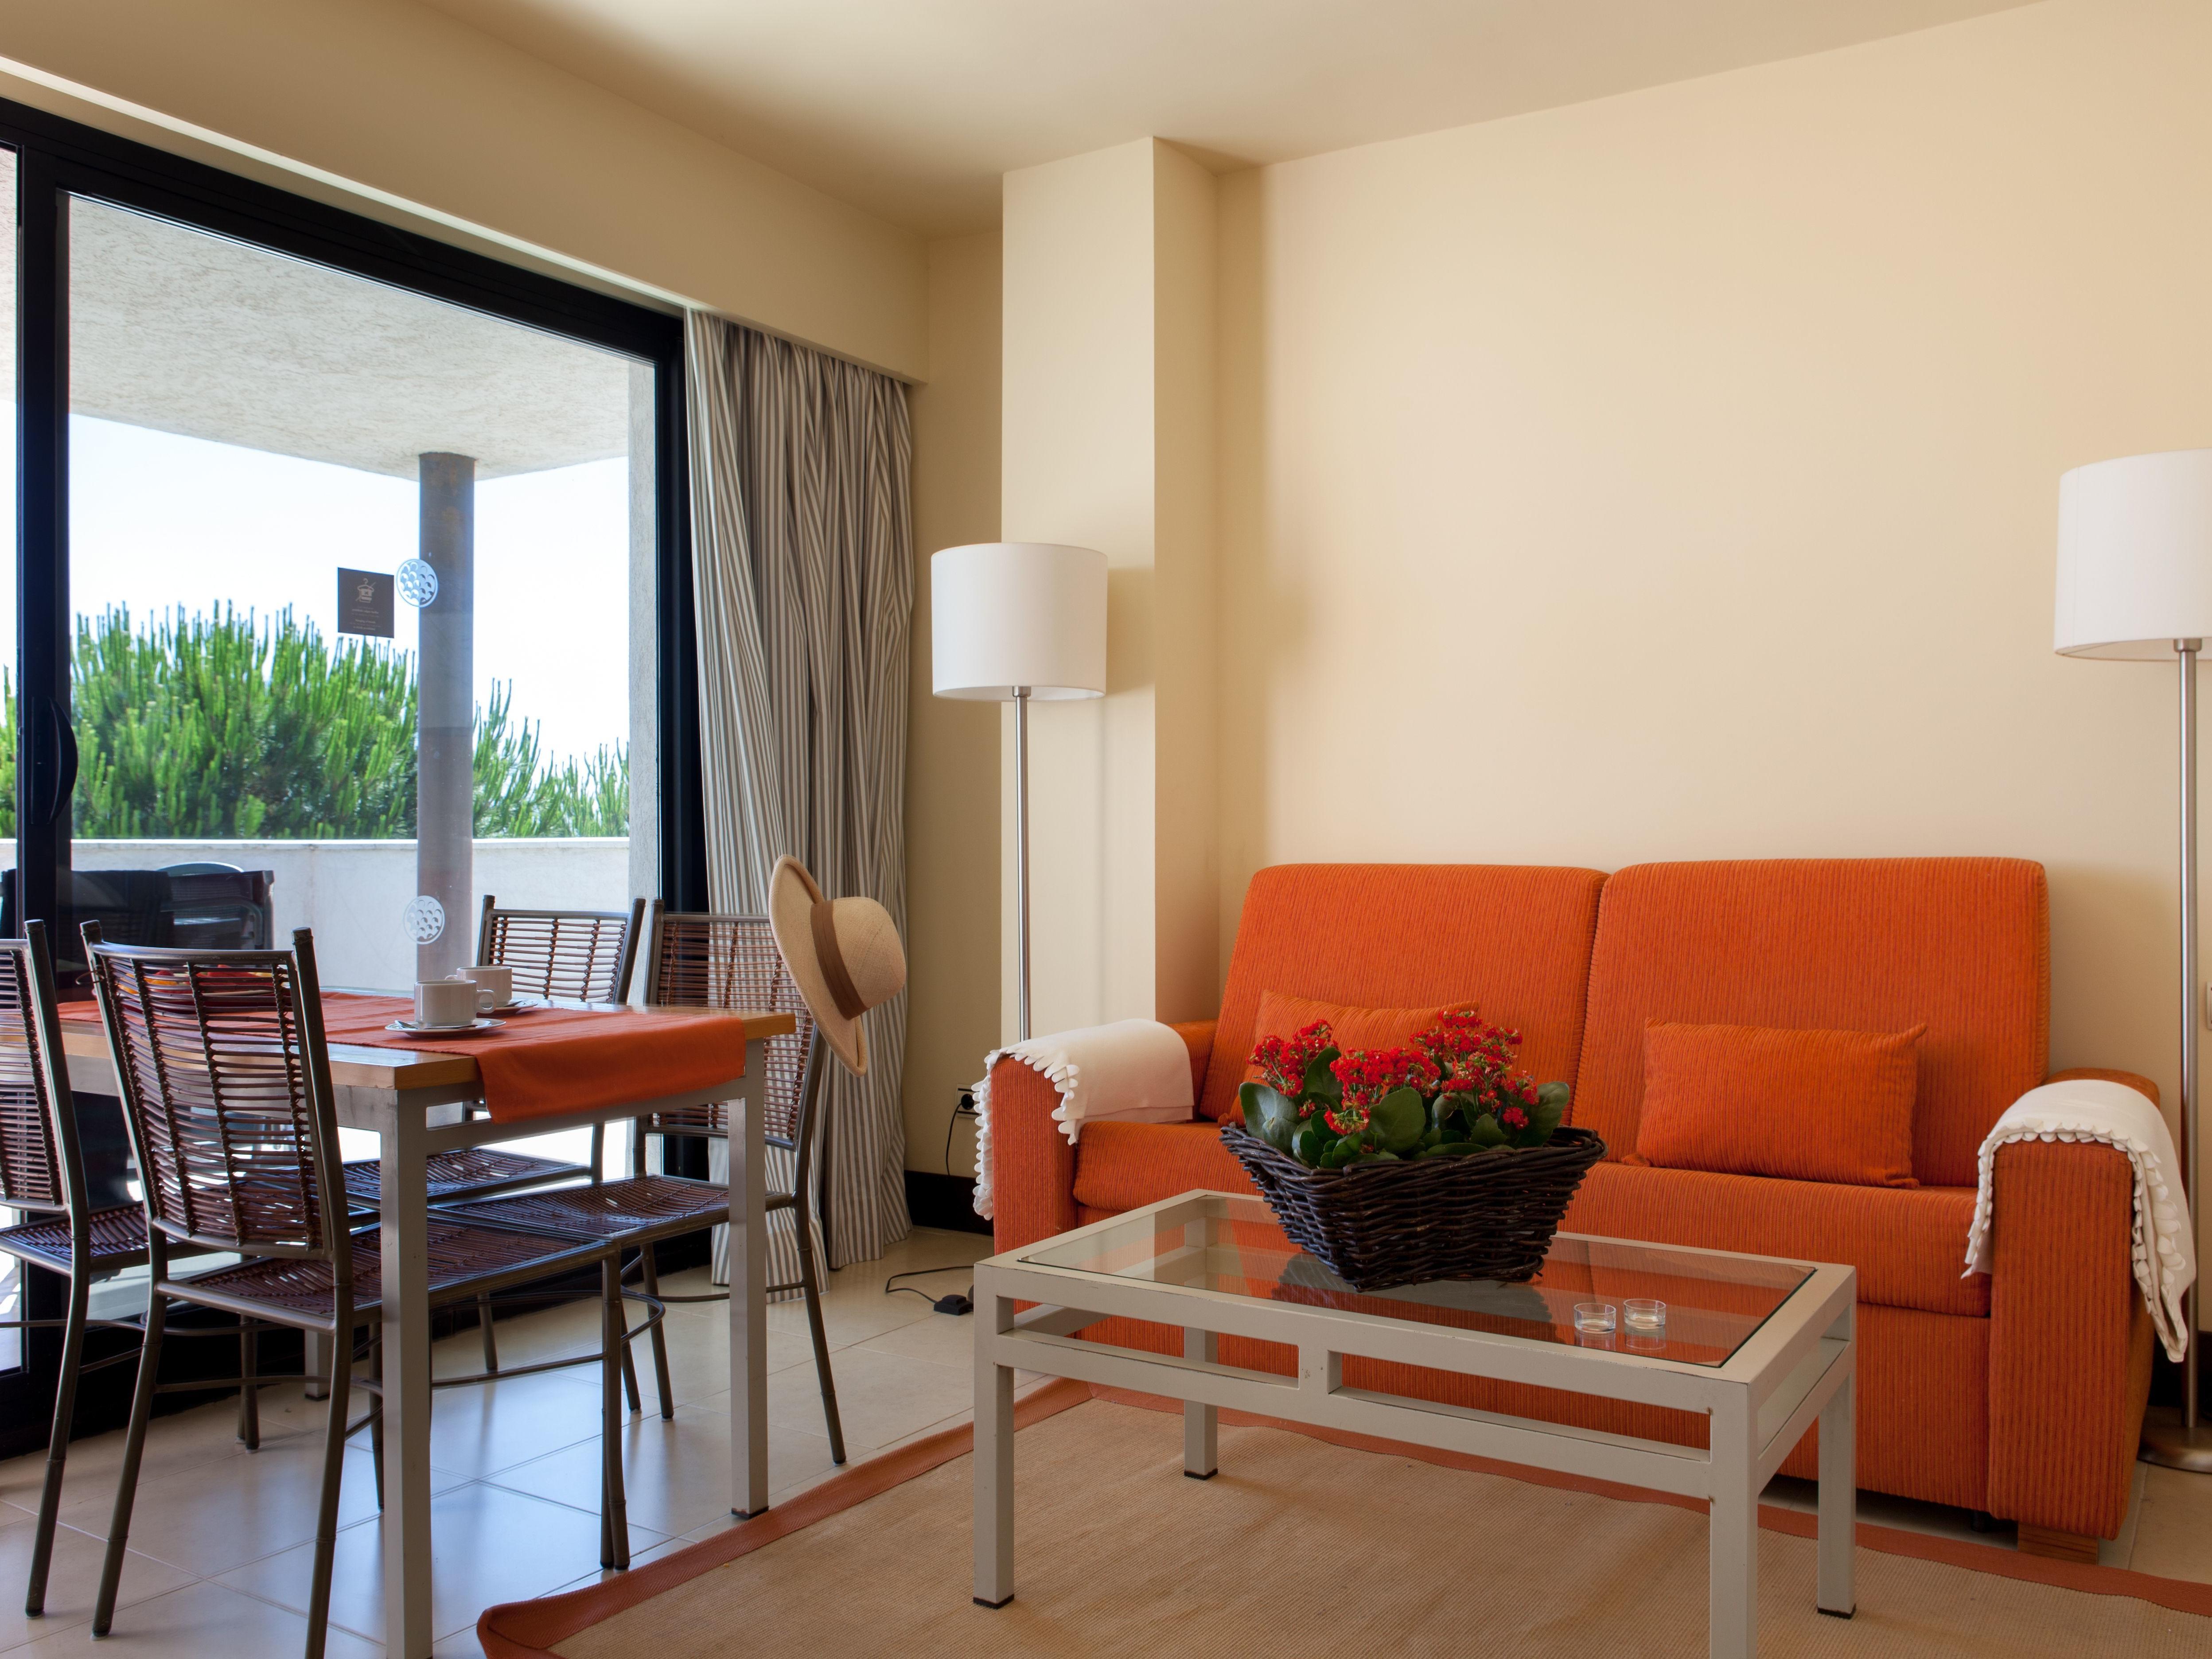 One bedroom apartment at Precise Resort El Rompido